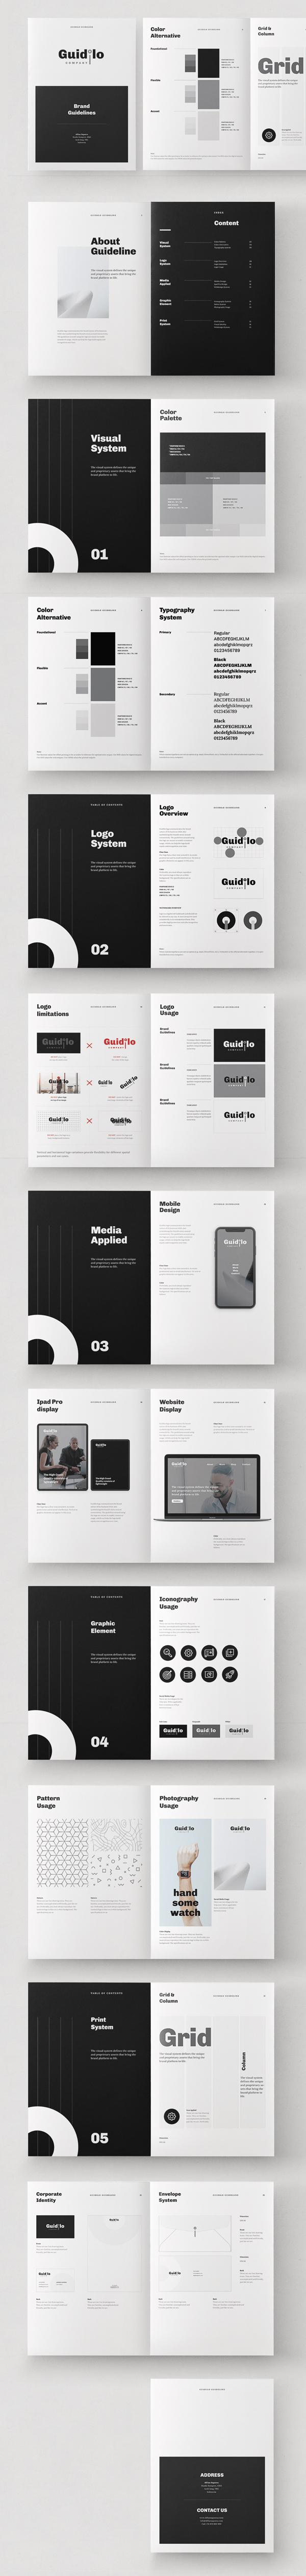 Brand Guideline Brochure InDesign Template